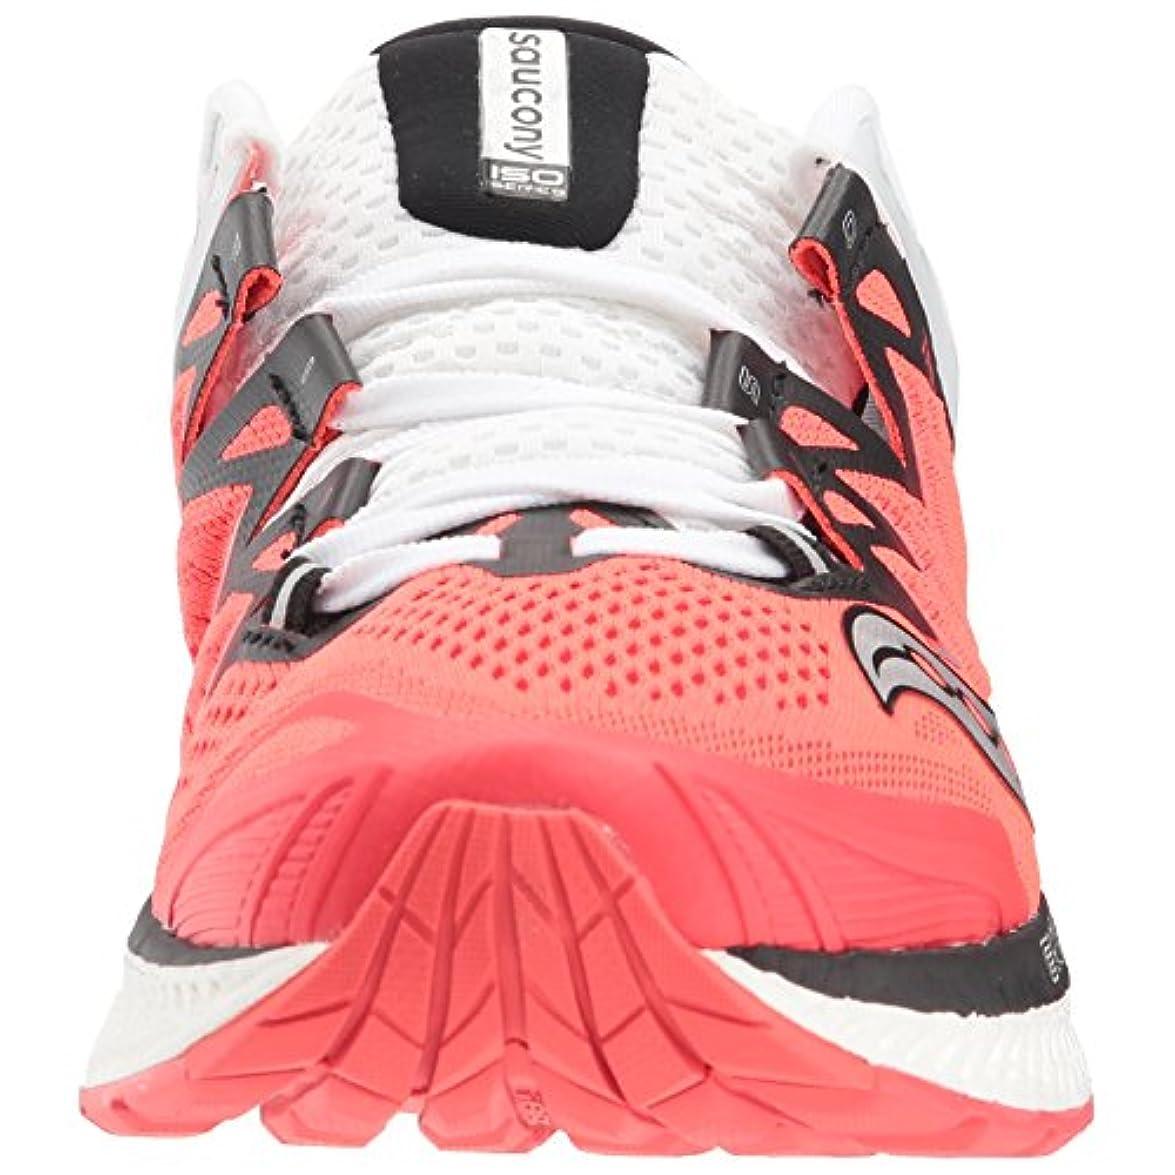 Saucony Triumph Iso 4 Sneaker Donna